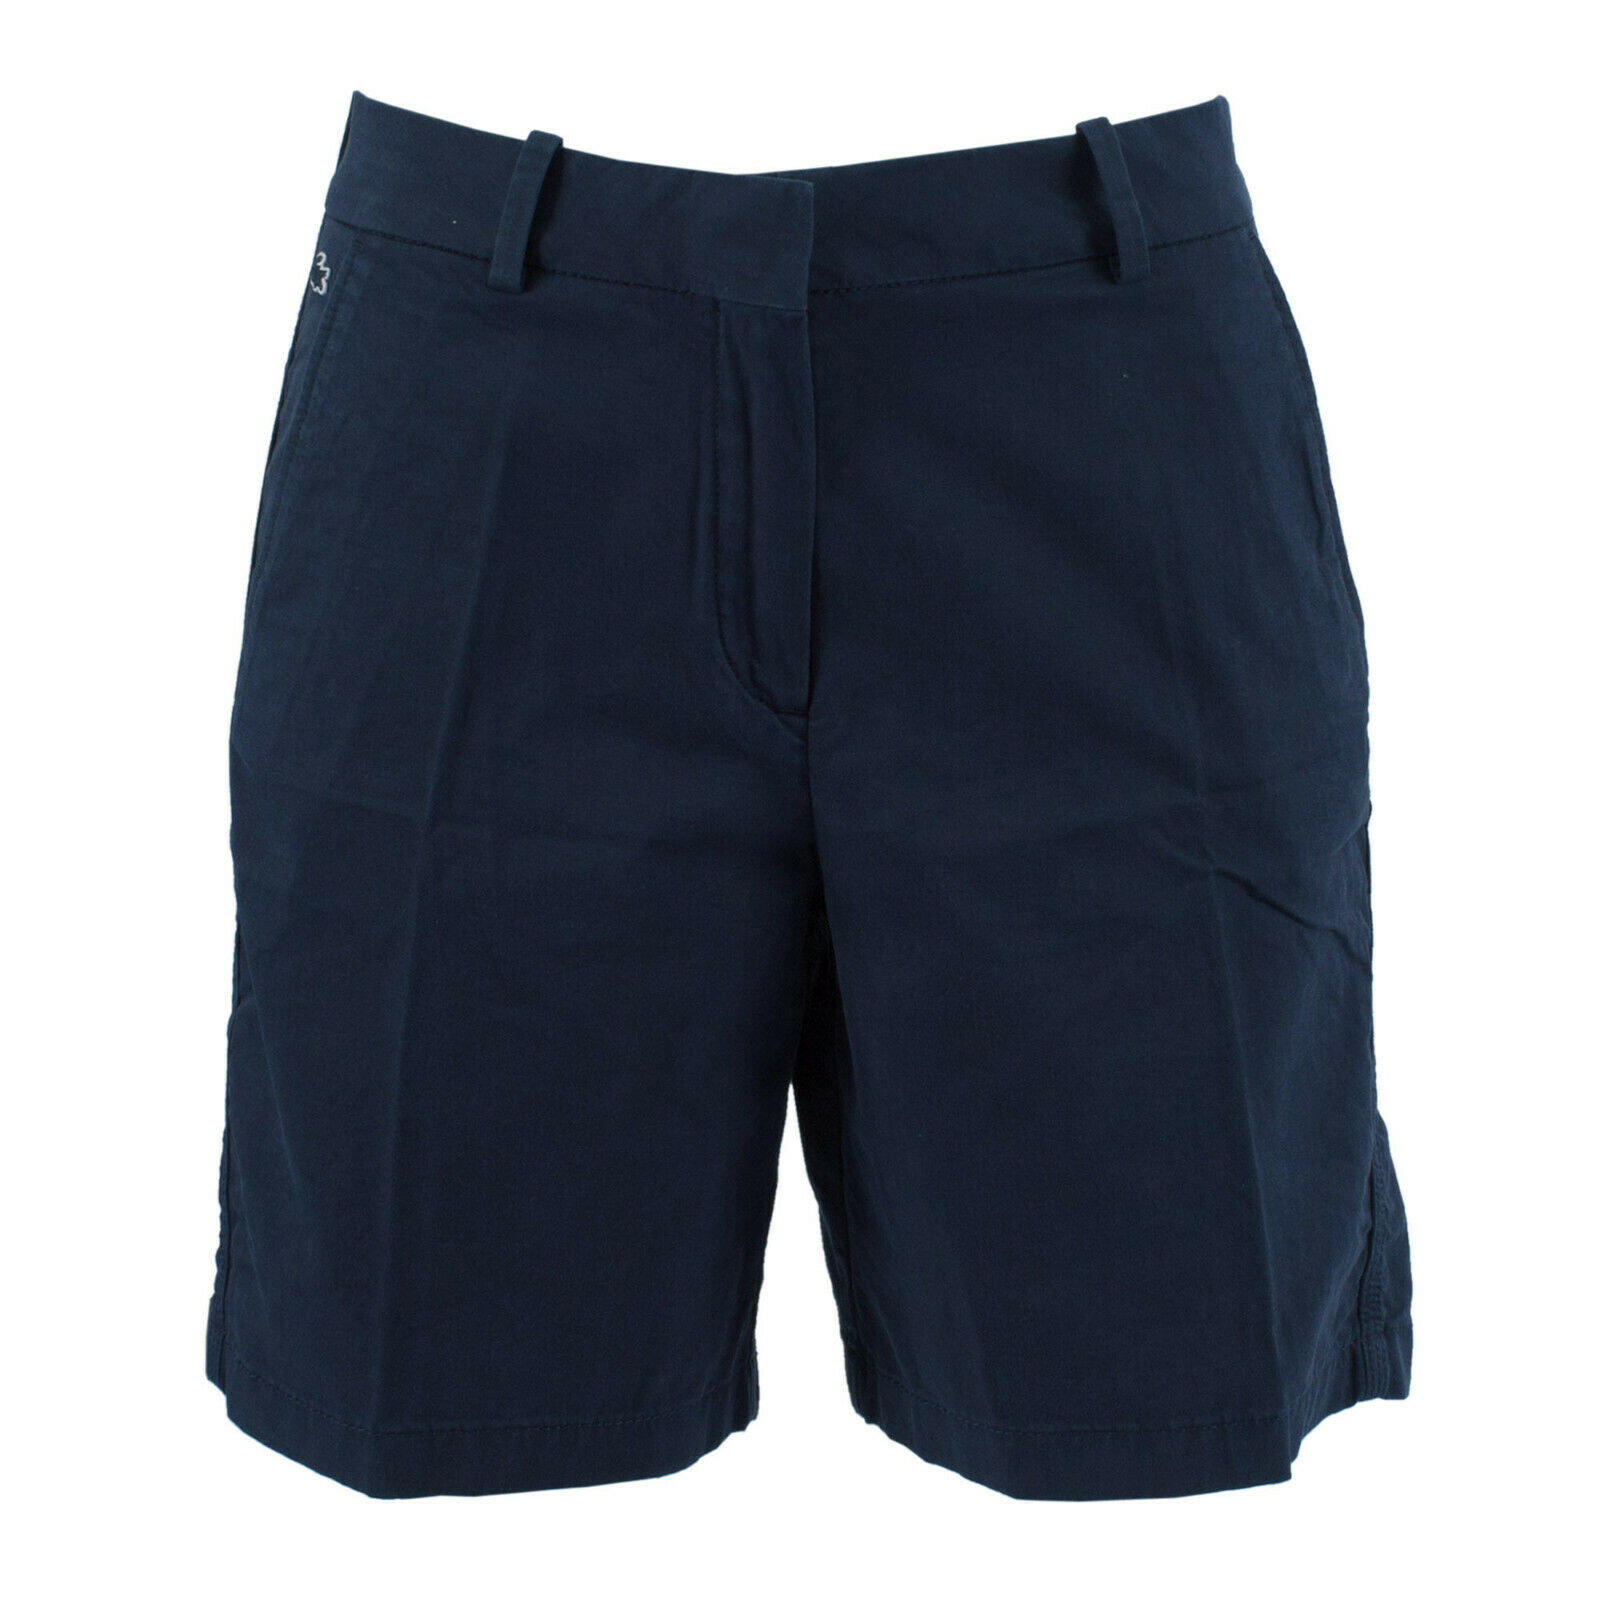 LACOSTE Damen Chino Shorts FF2966-00-166 Marine / 32 (F 34) / kurze Hose, Sommer